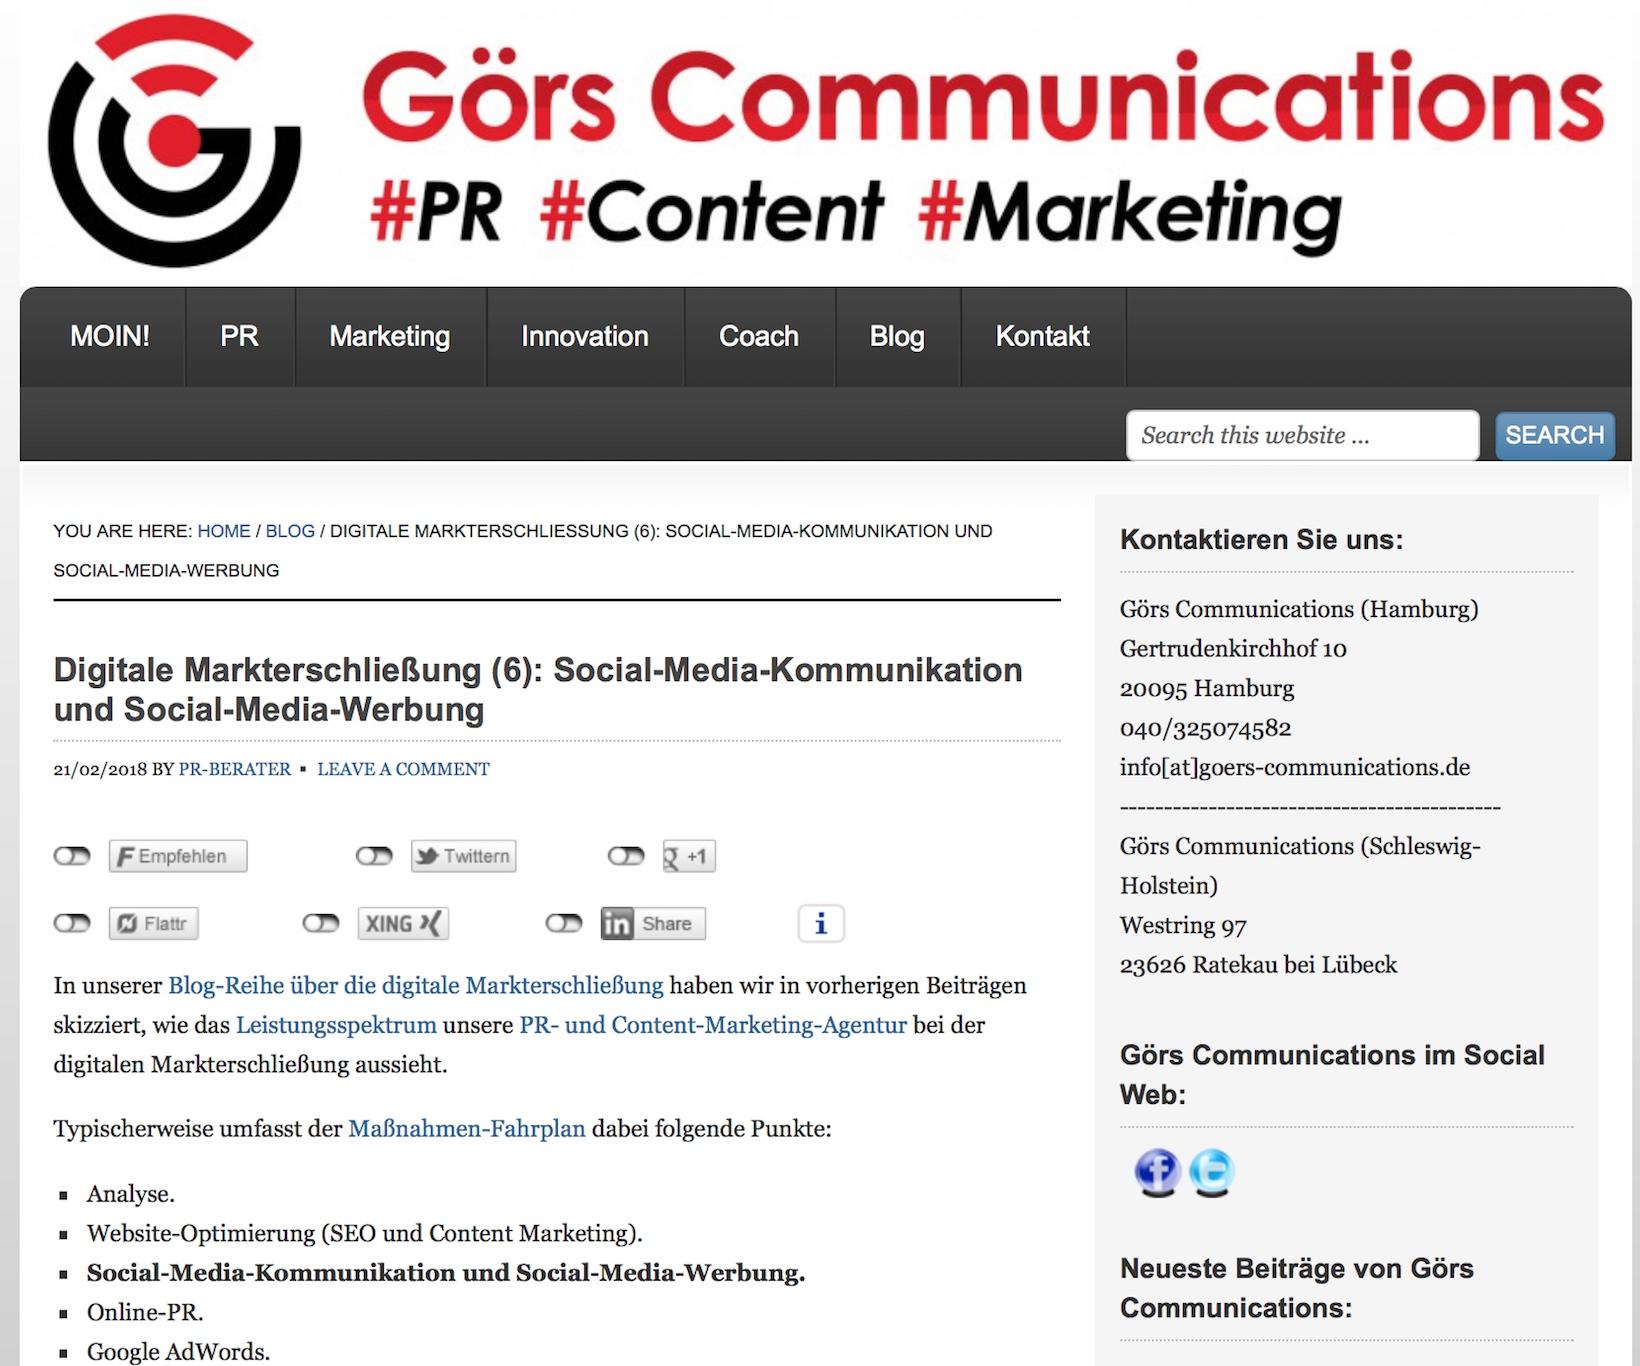 Digitale Markterschließung mit Social Media Kommunikation und Social Media Werbung